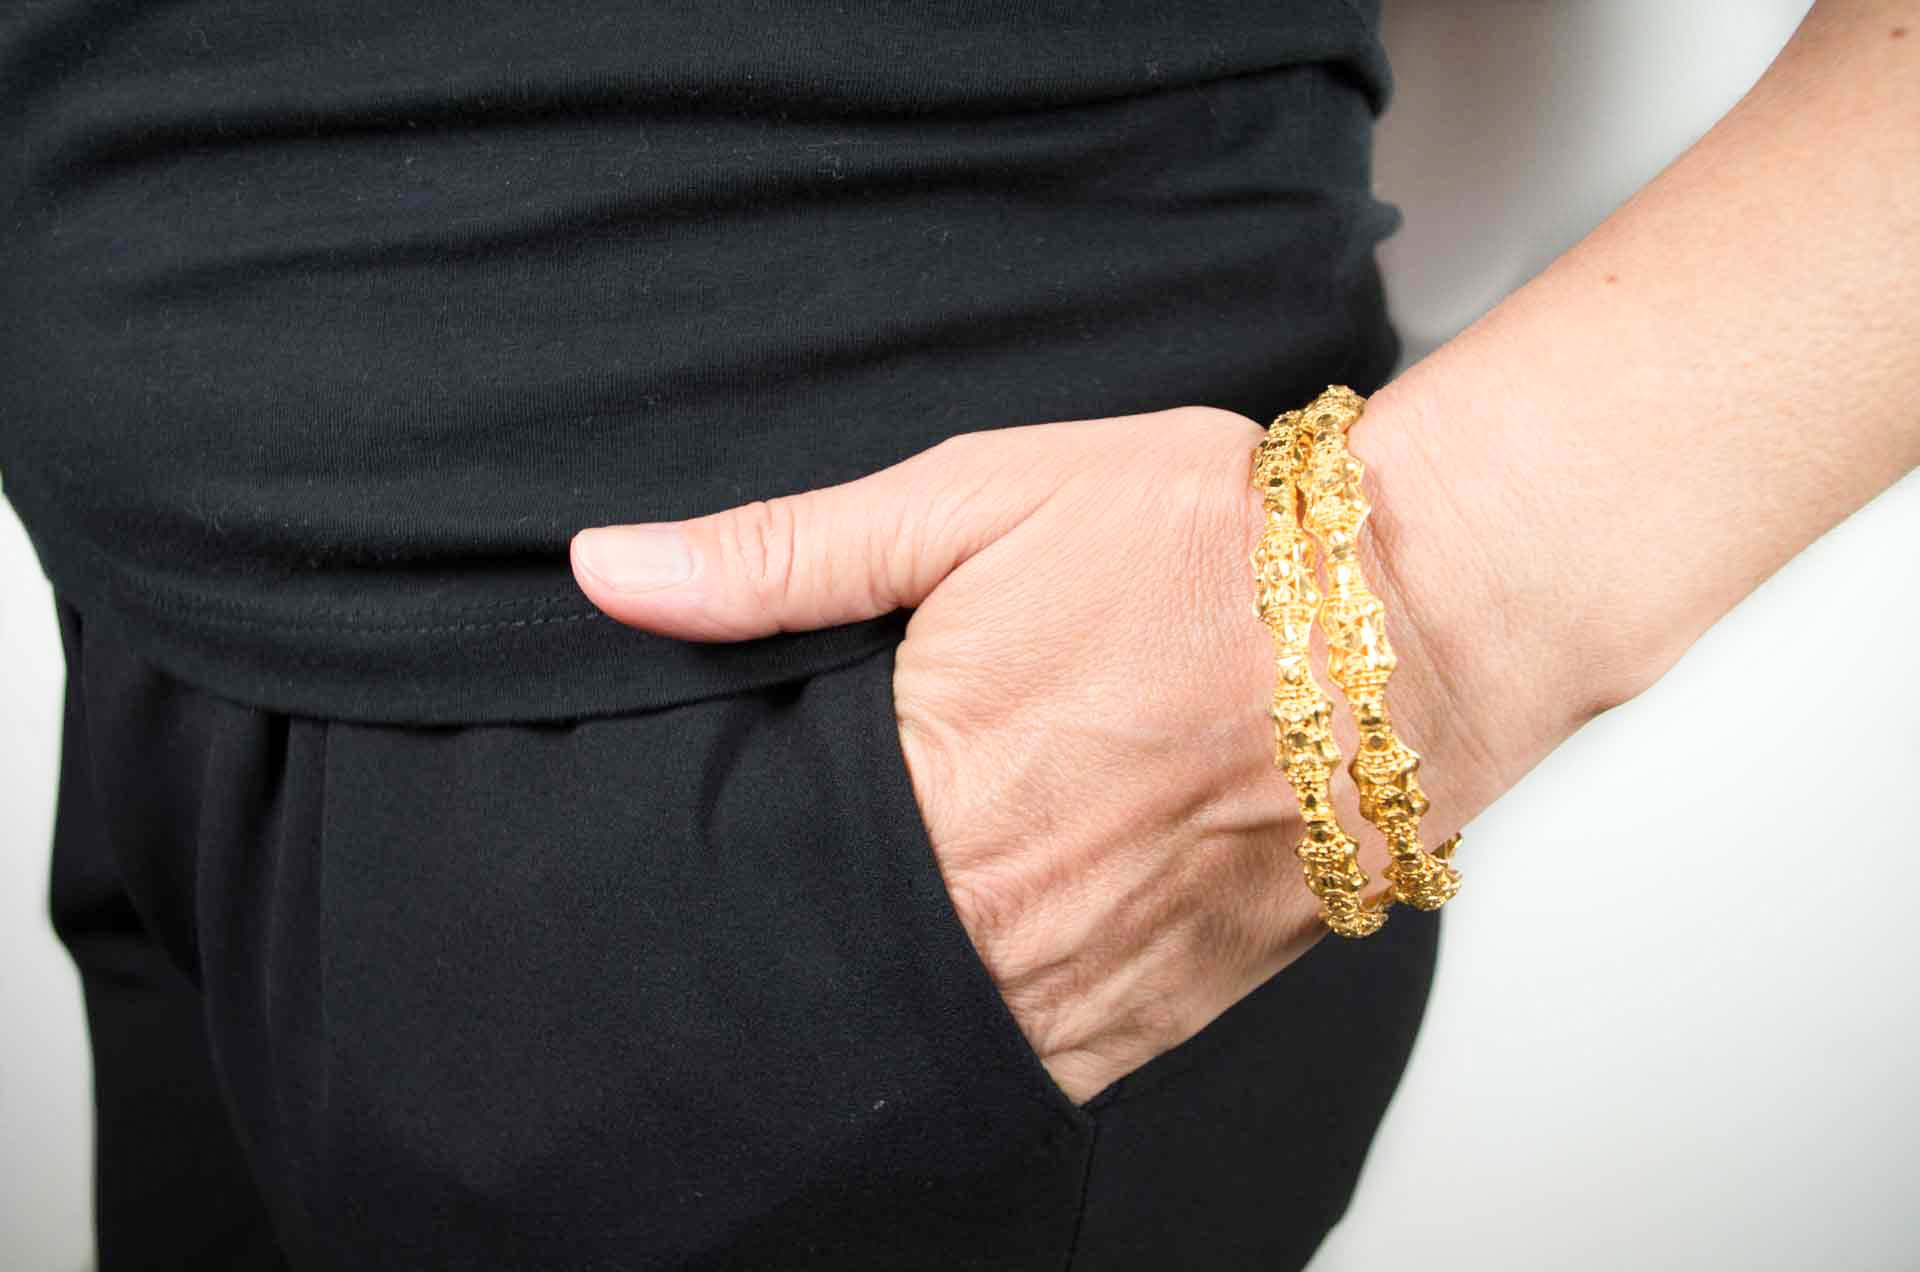 coppia di bracciali dorati